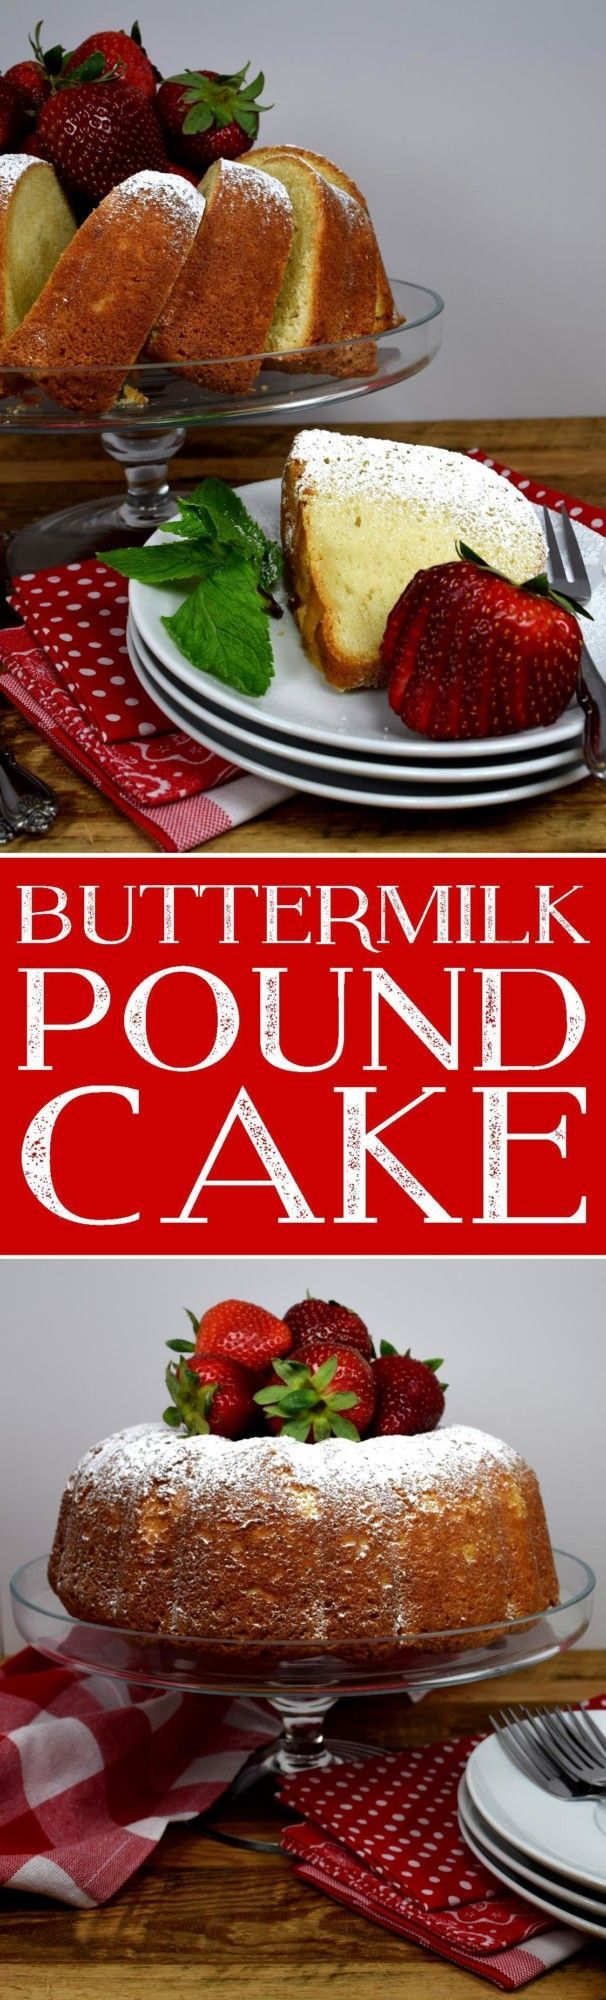 Butermilk Pound Cake